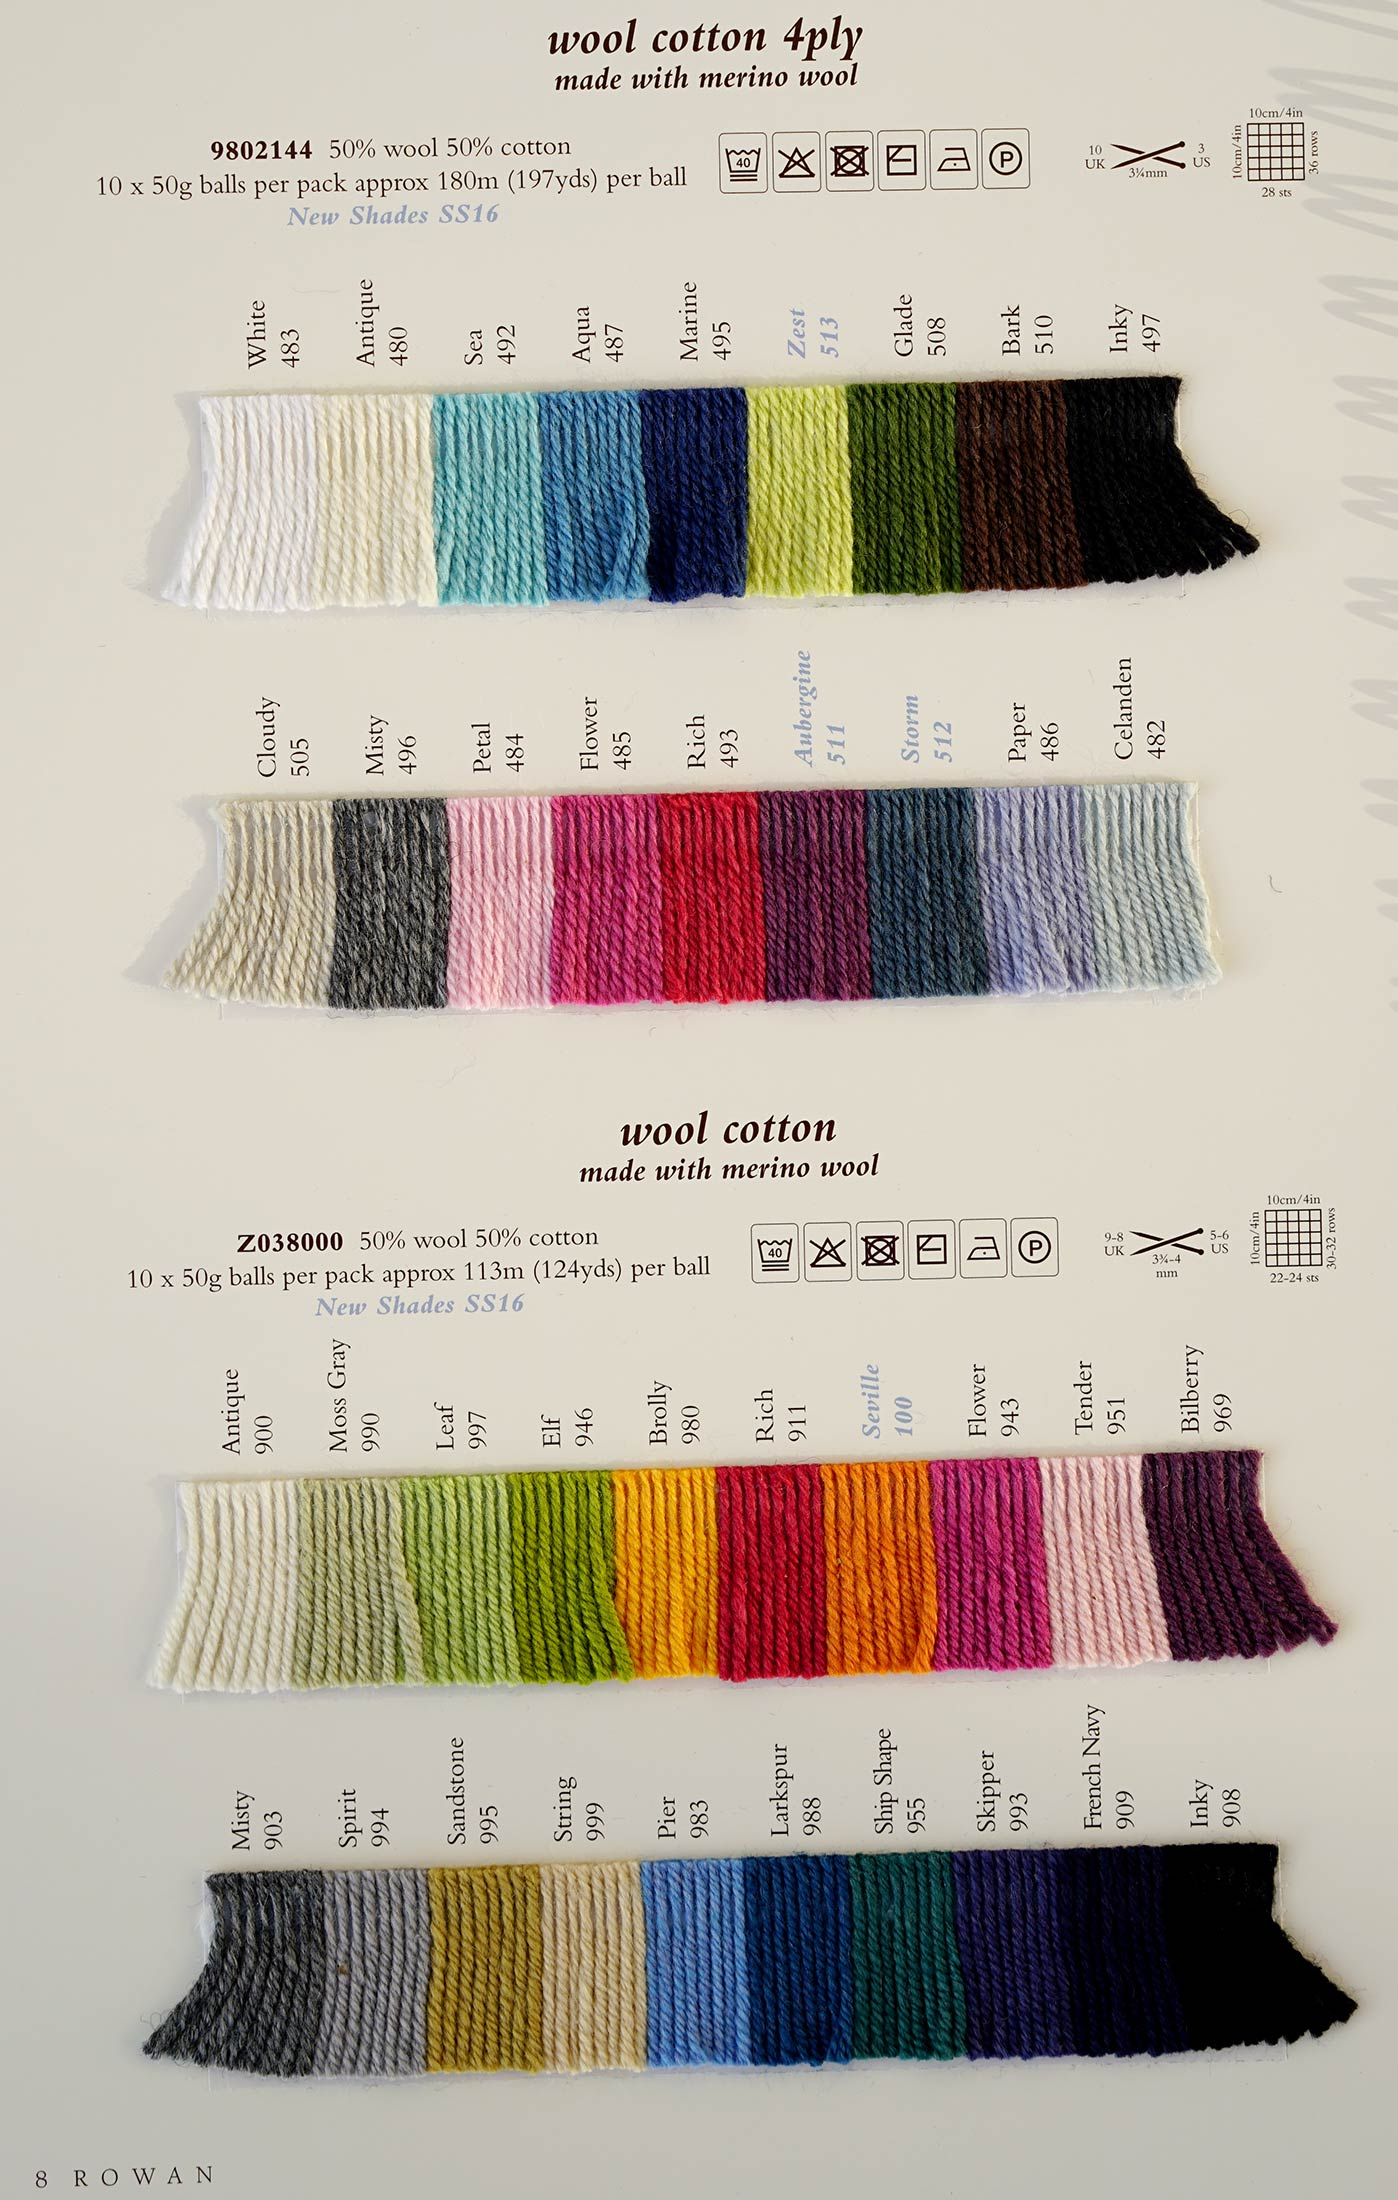 Knitting Patterns Rowan Wool Cotton : Rowan Wool Cotton DK - Rowan Yarns RYC Sirdar Sublime English Yarns knitting ...